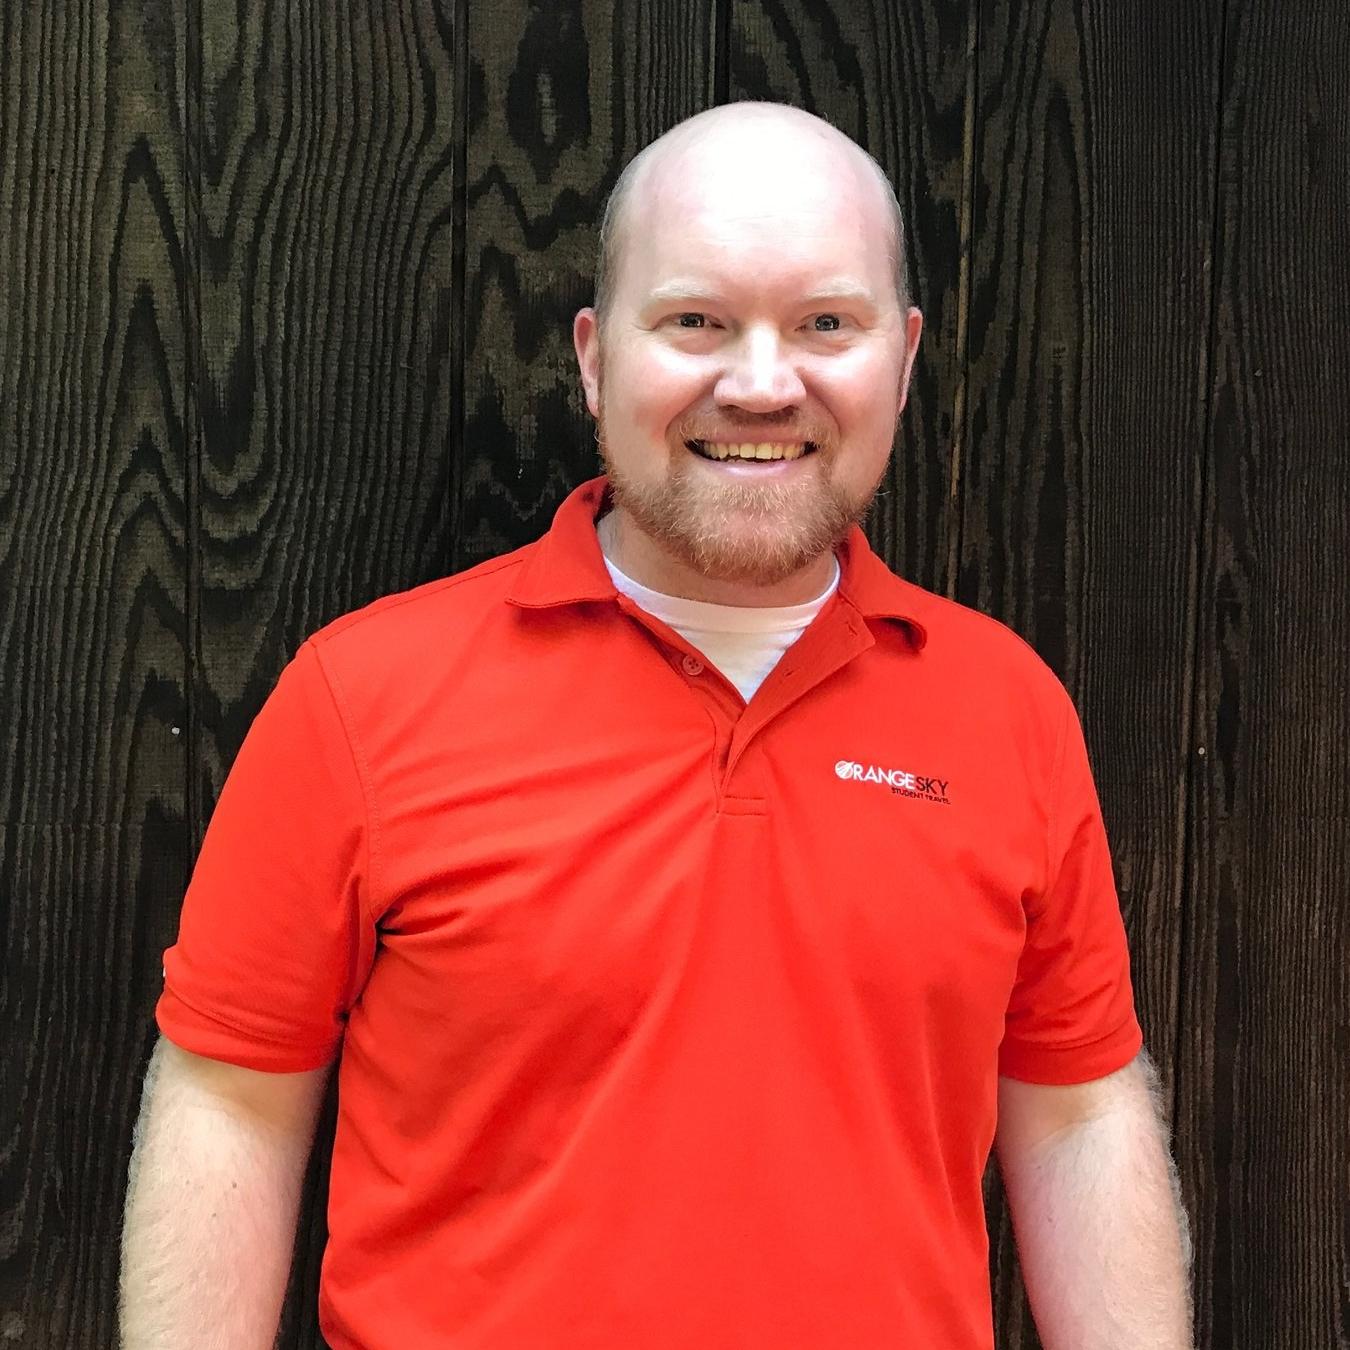 Jason McCall - Co-FounderLaunch Team Leaderjason@orangeskytravel.com